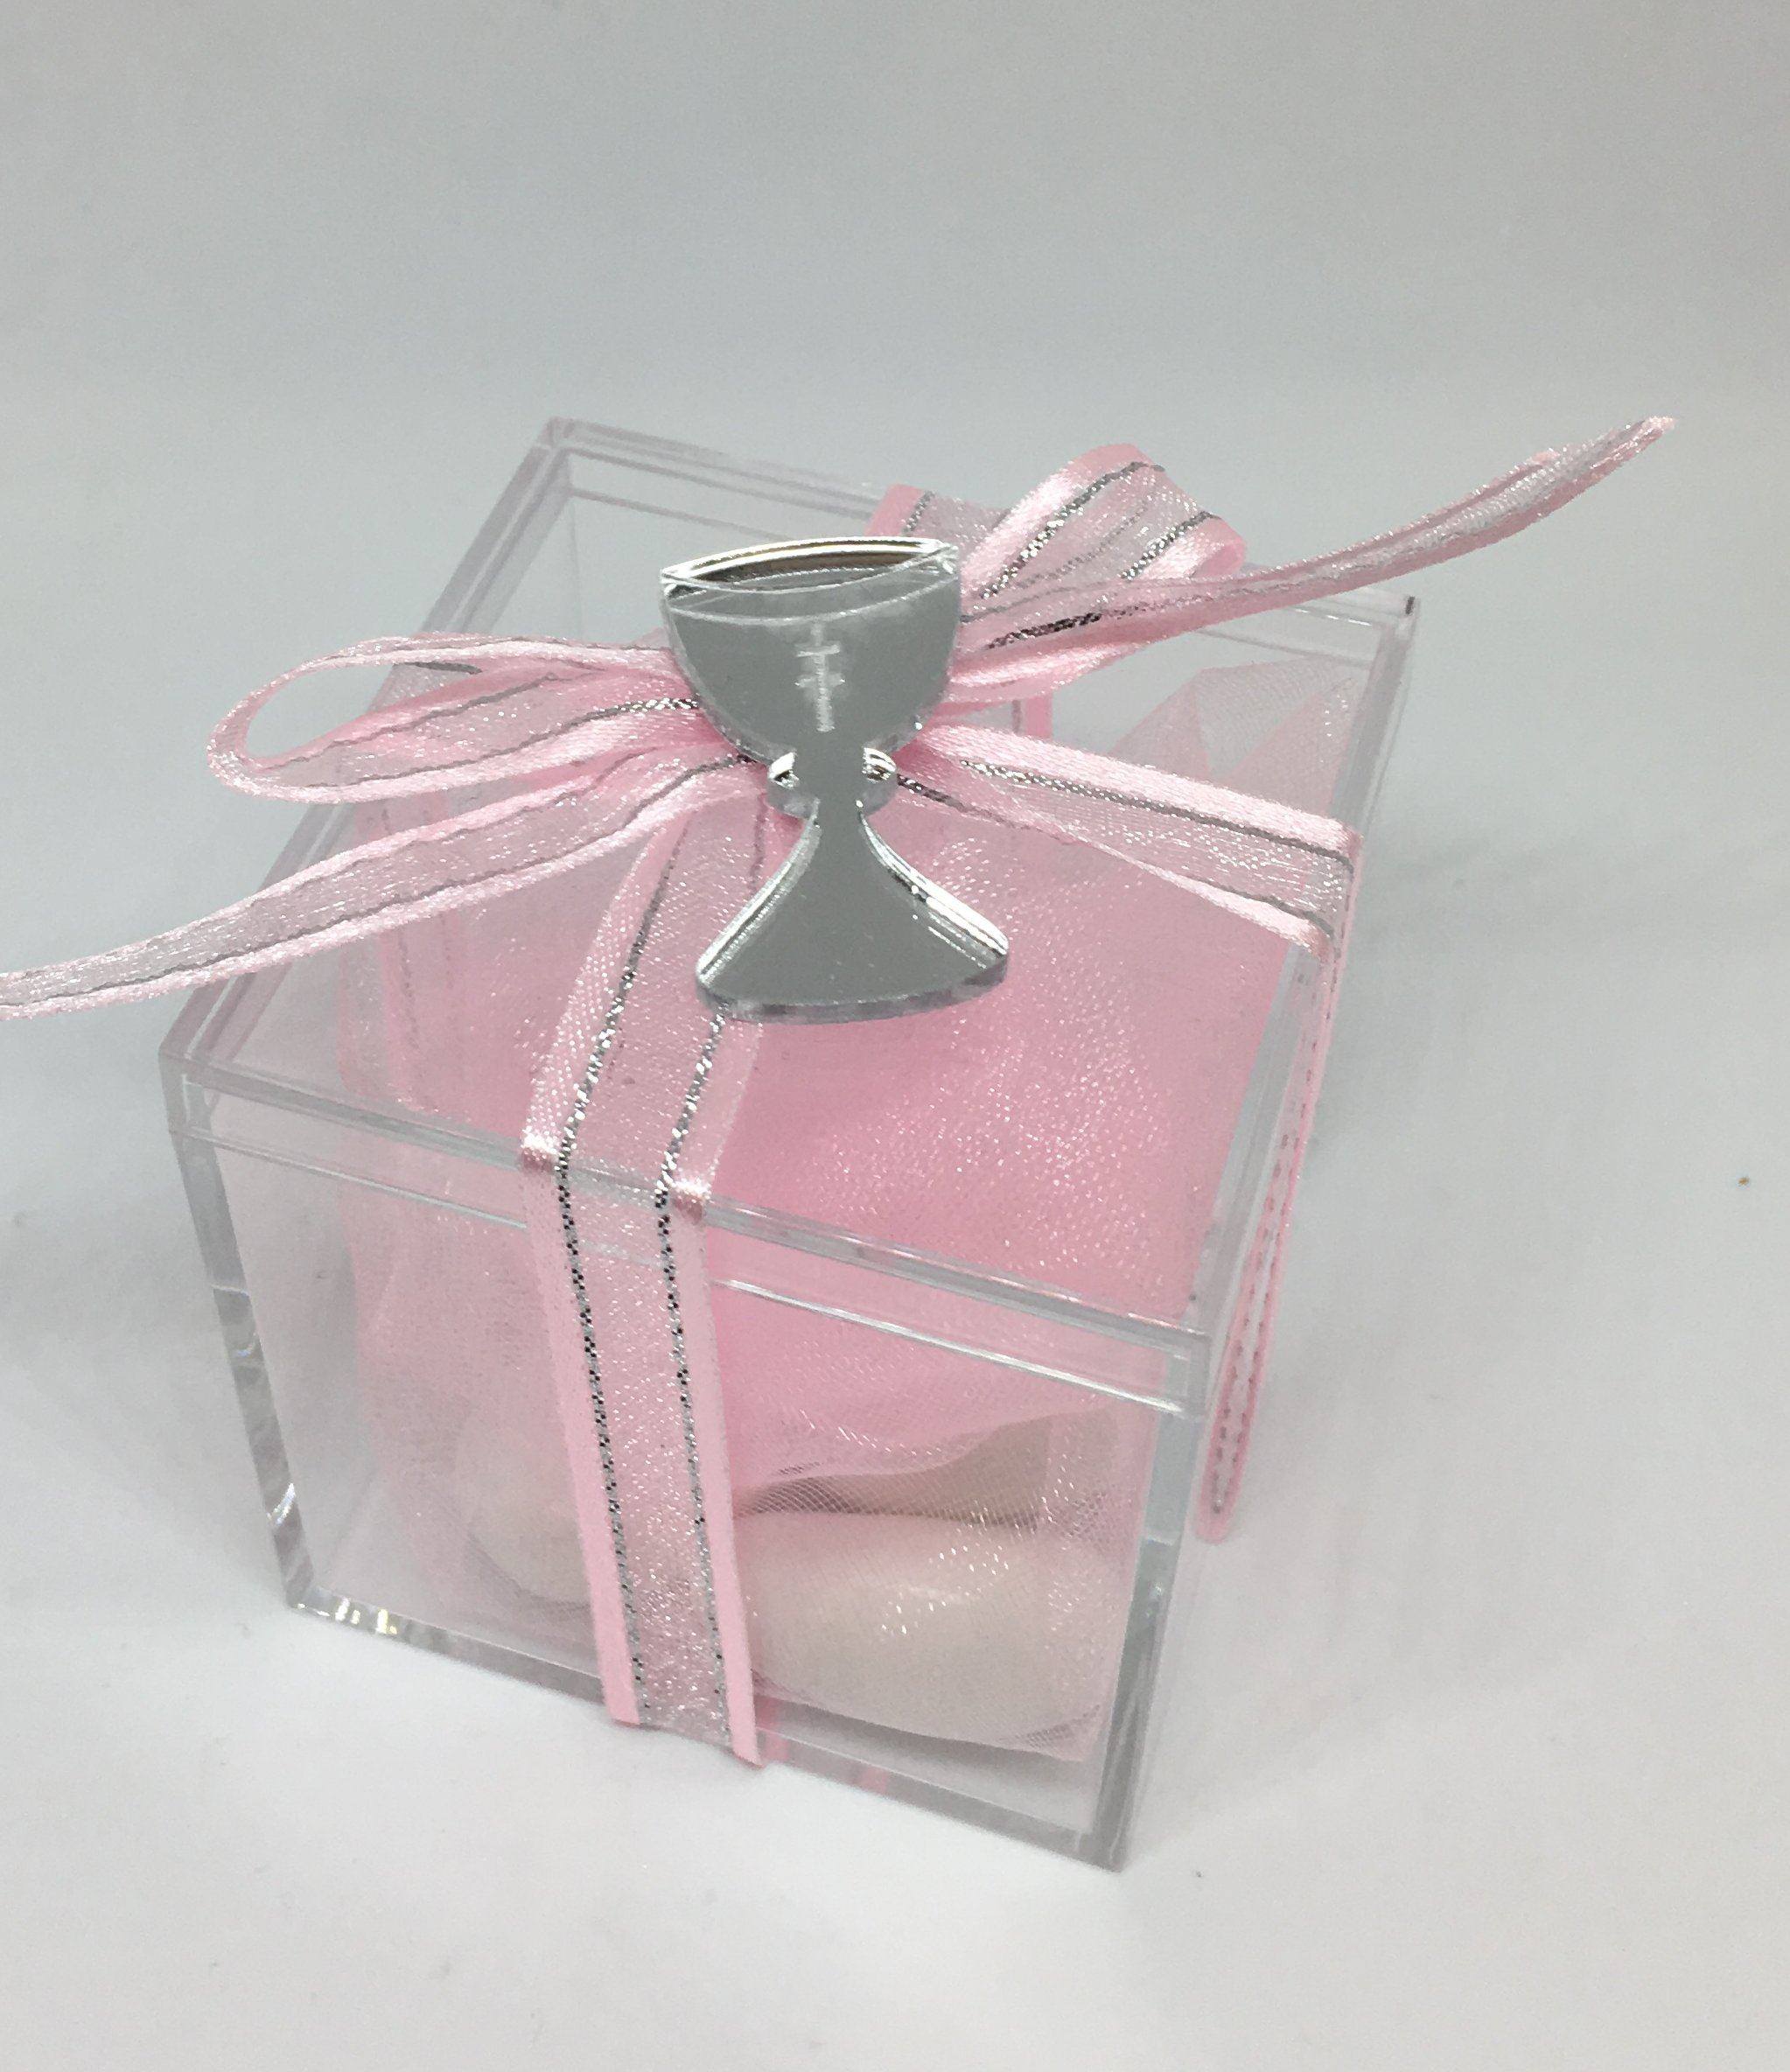 Acrylic Box with Acrylic Mirror Chalice Charm